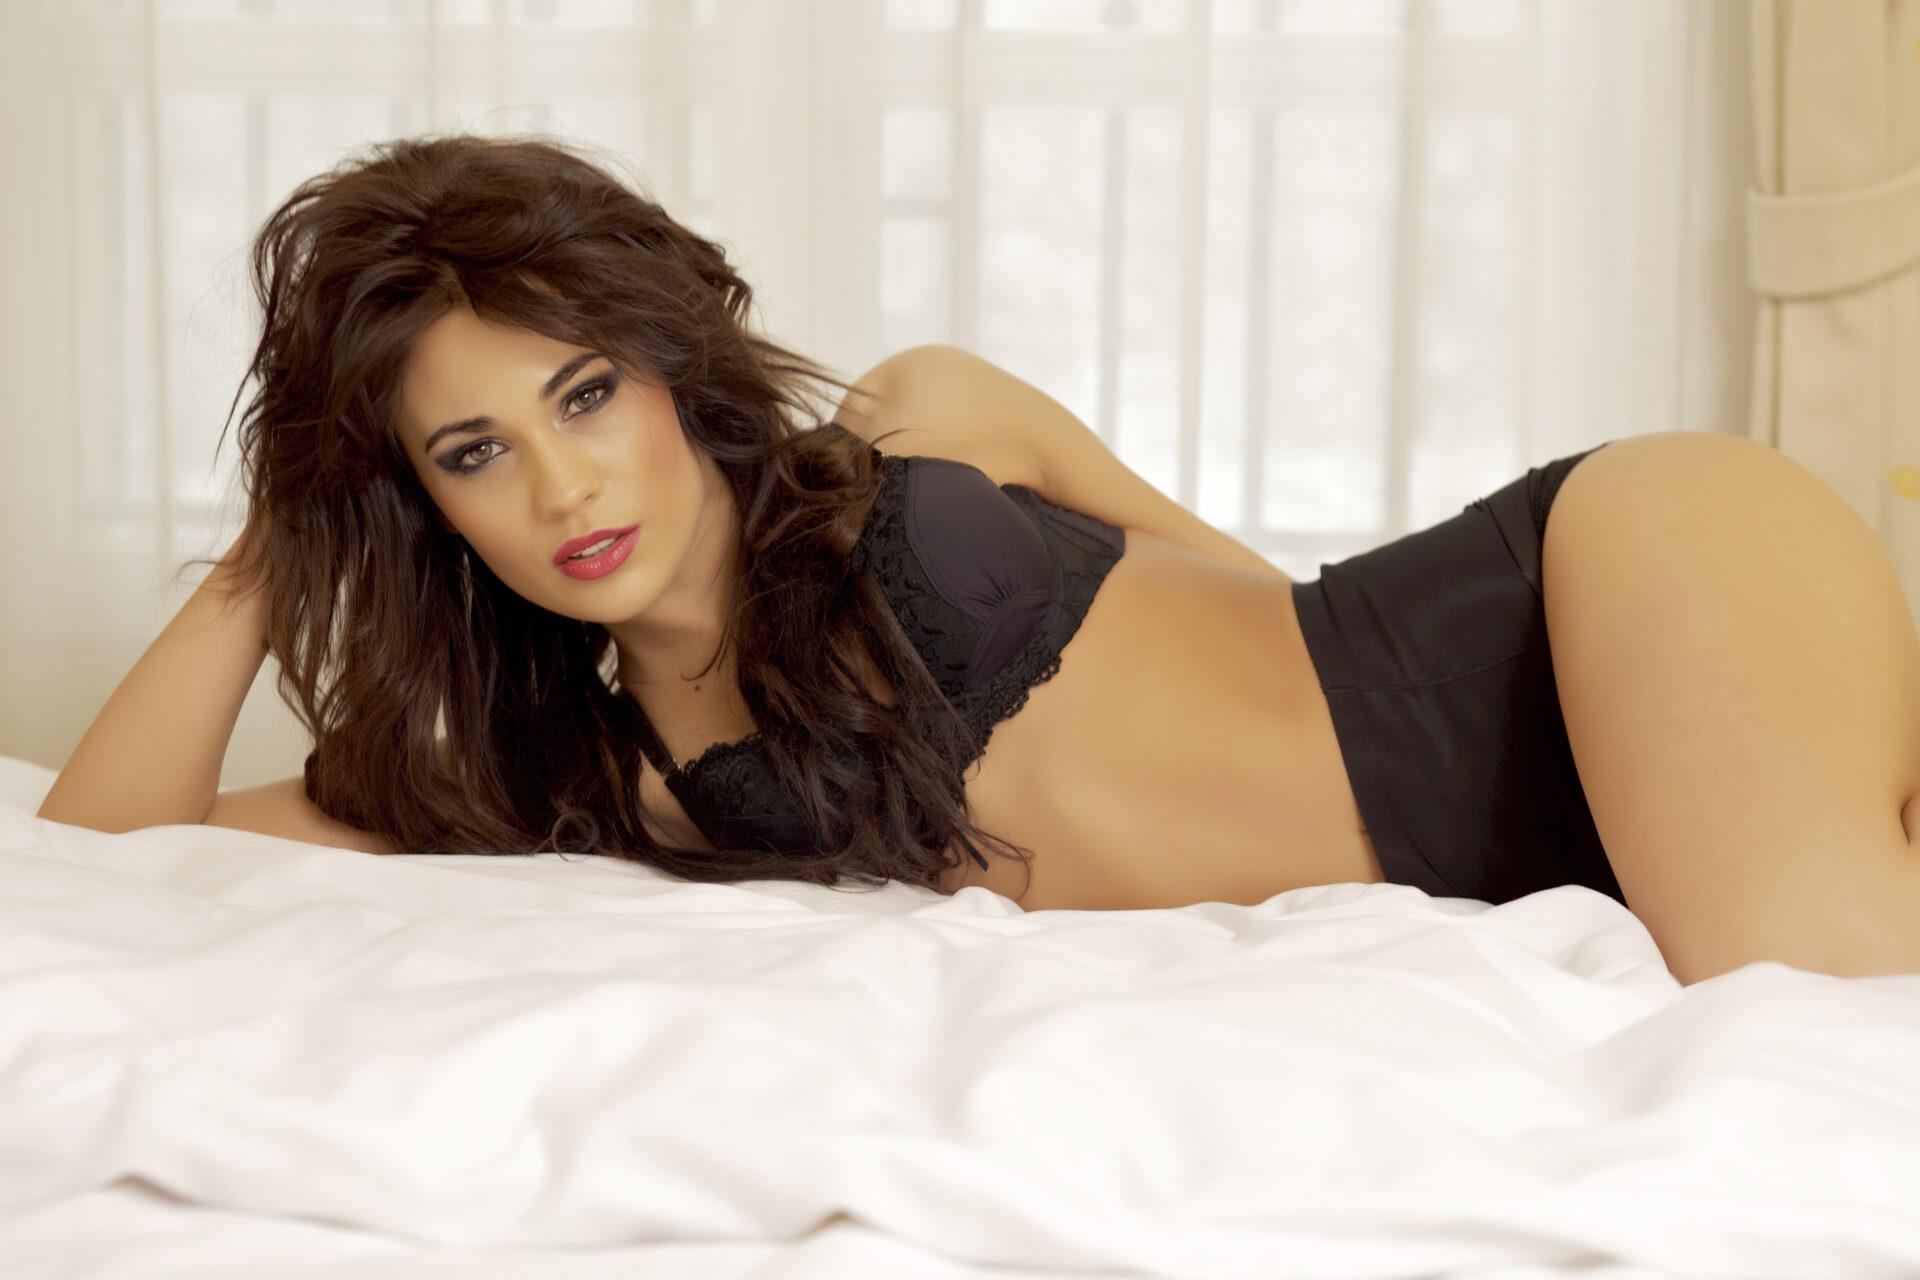 beautiful boudoir photo of a sexy girl